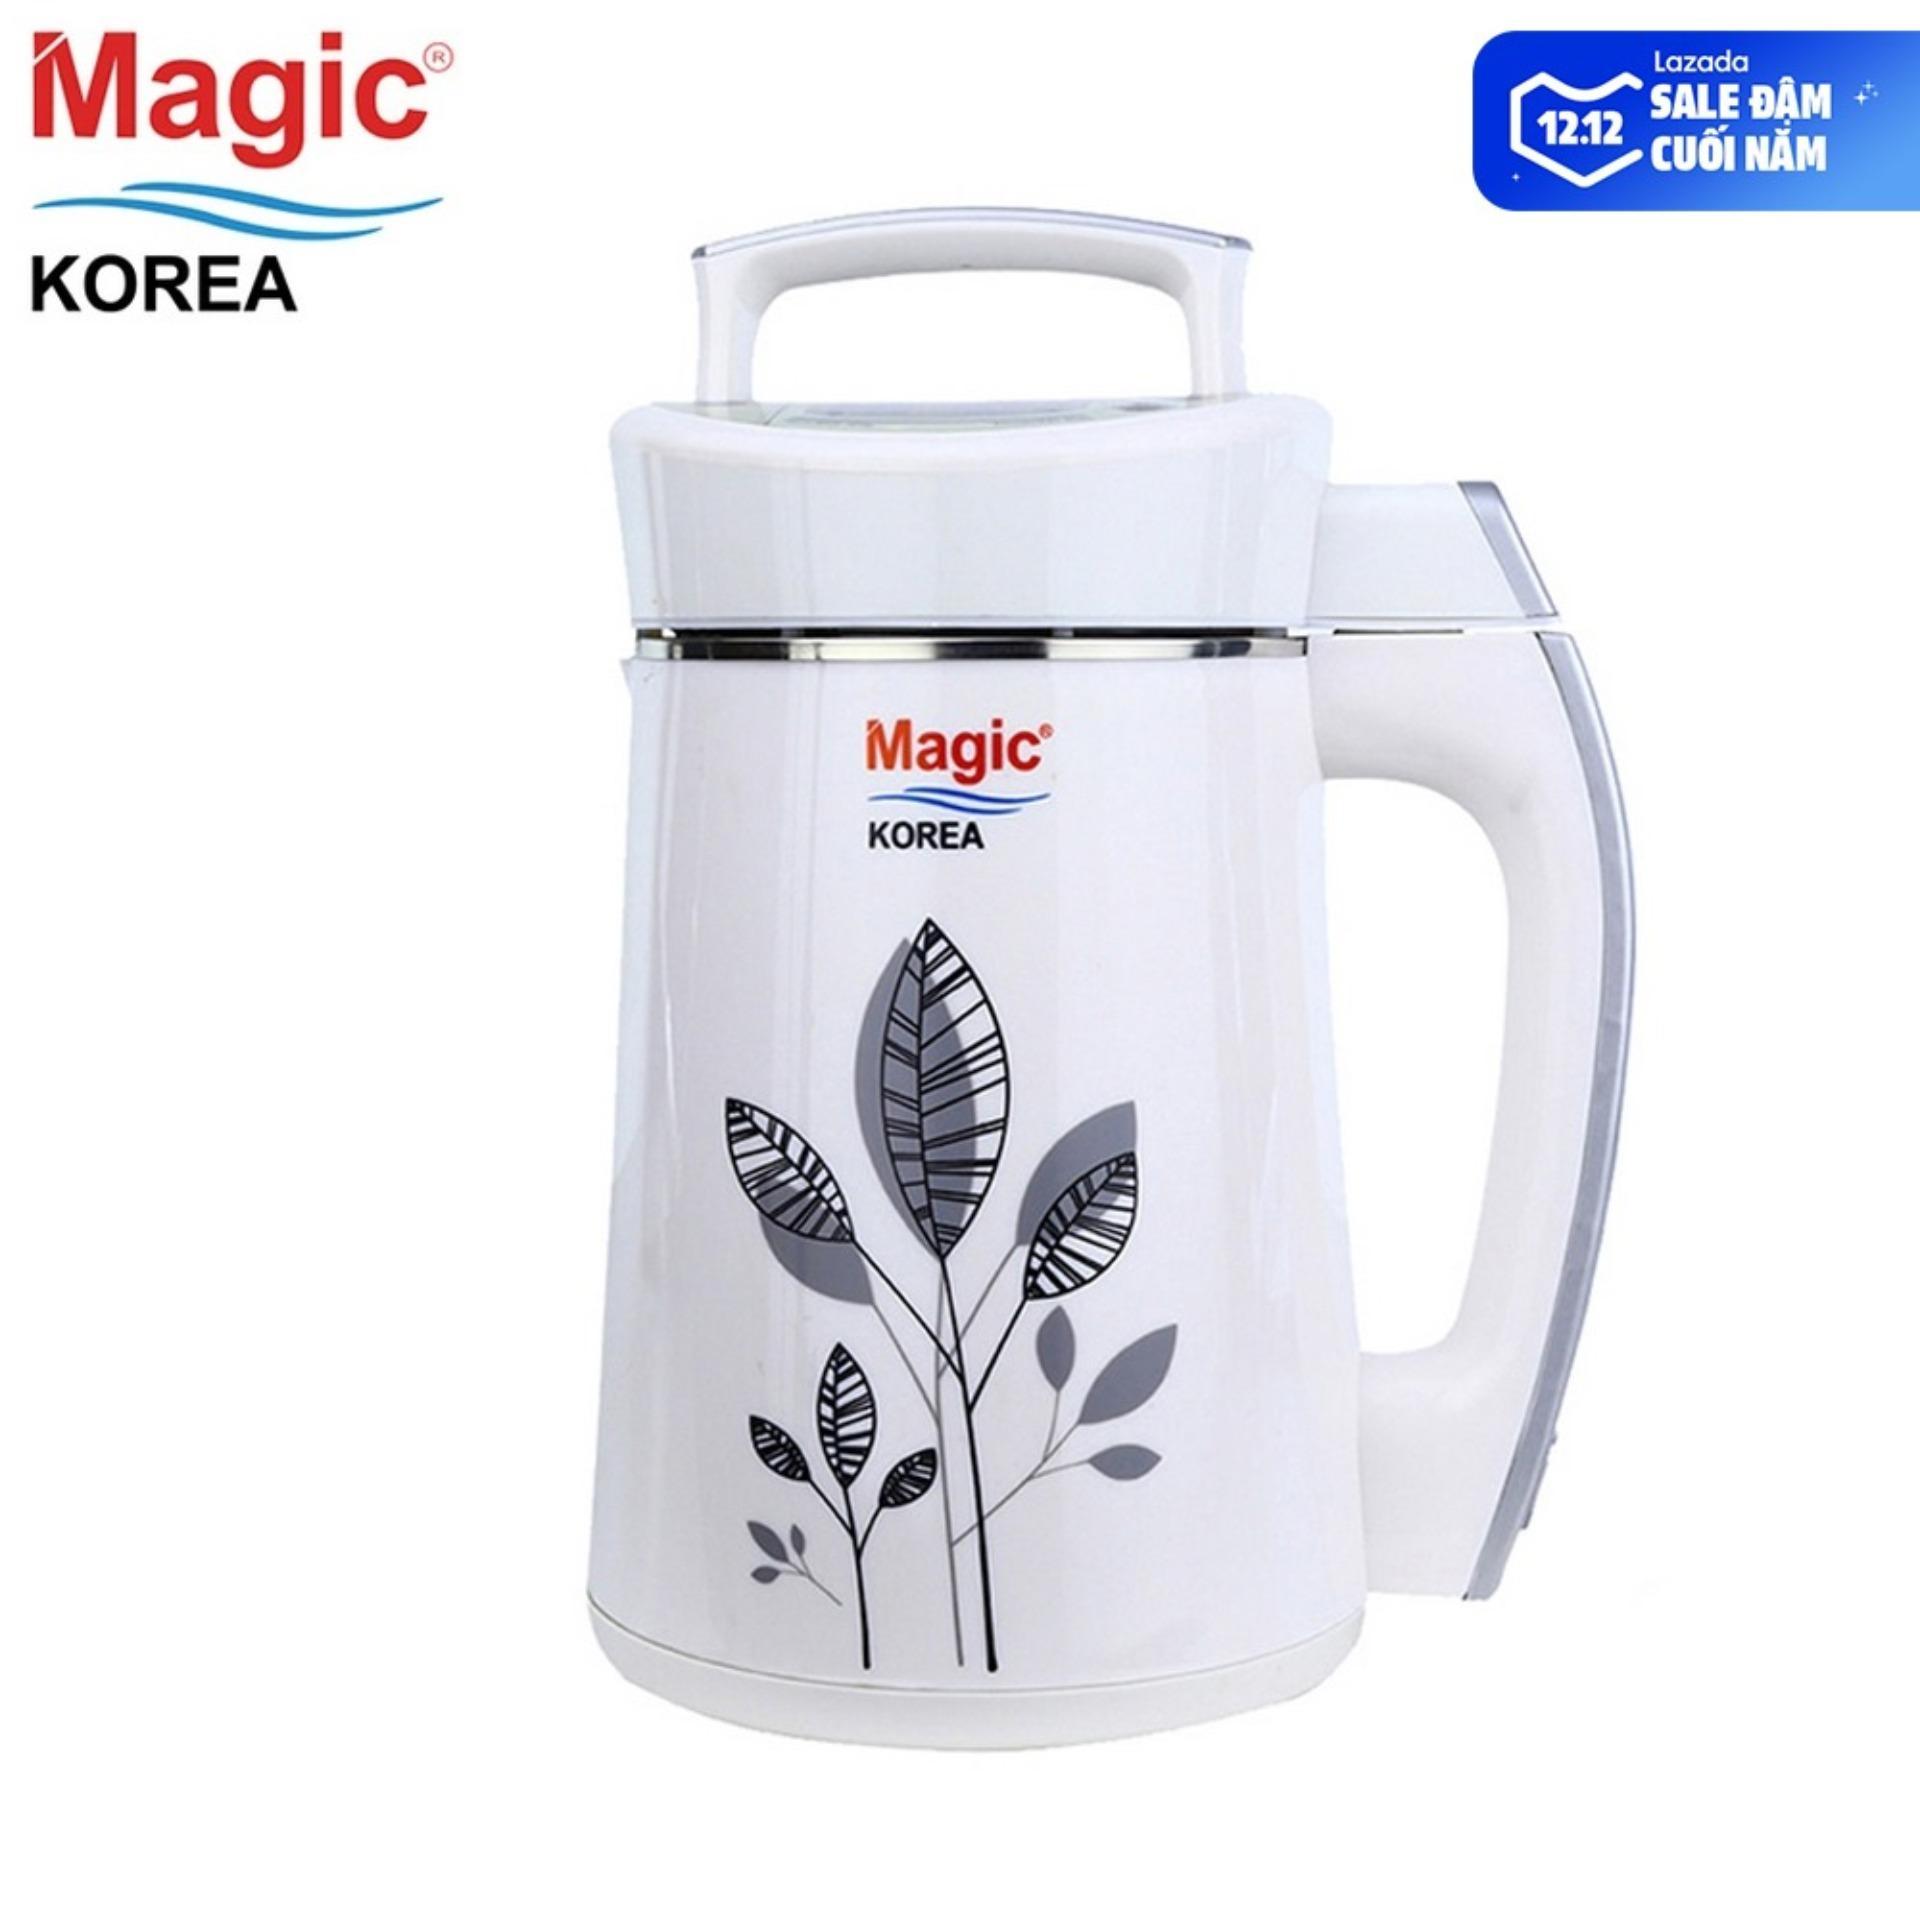 Máy làm sữa đậu nành Magic Korea A68